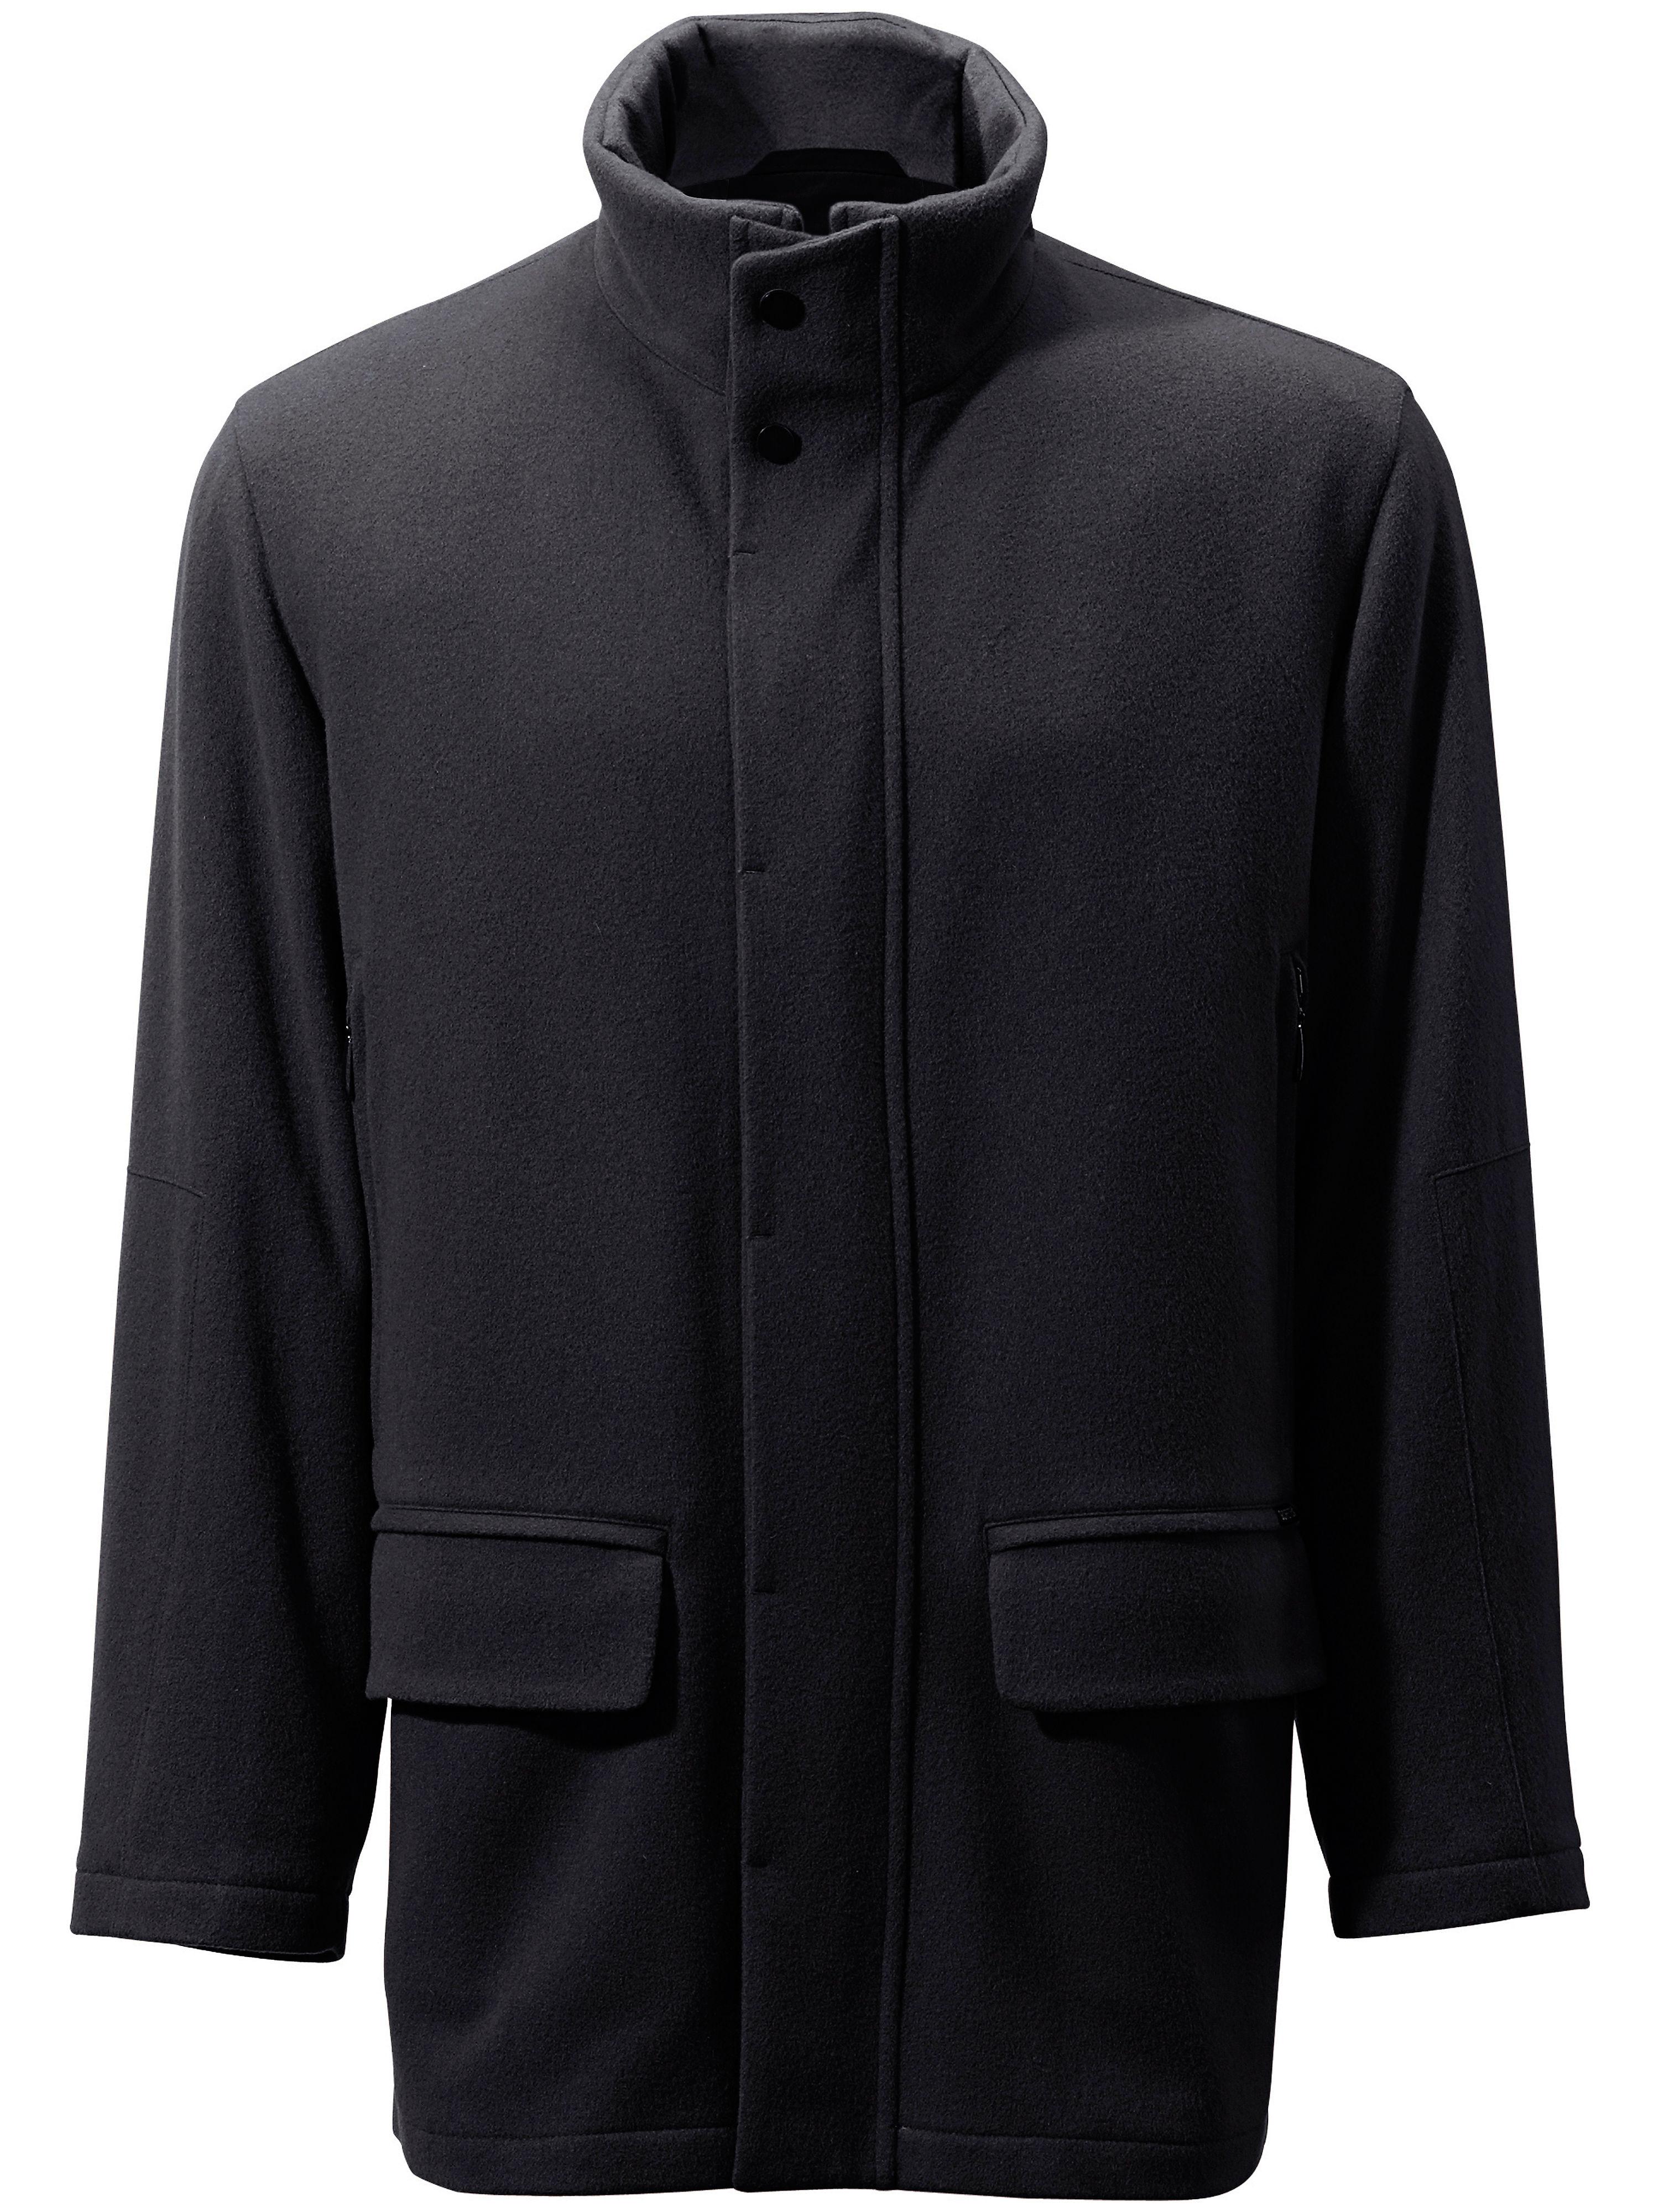 La veste  Lodenfrey bleu taille 26